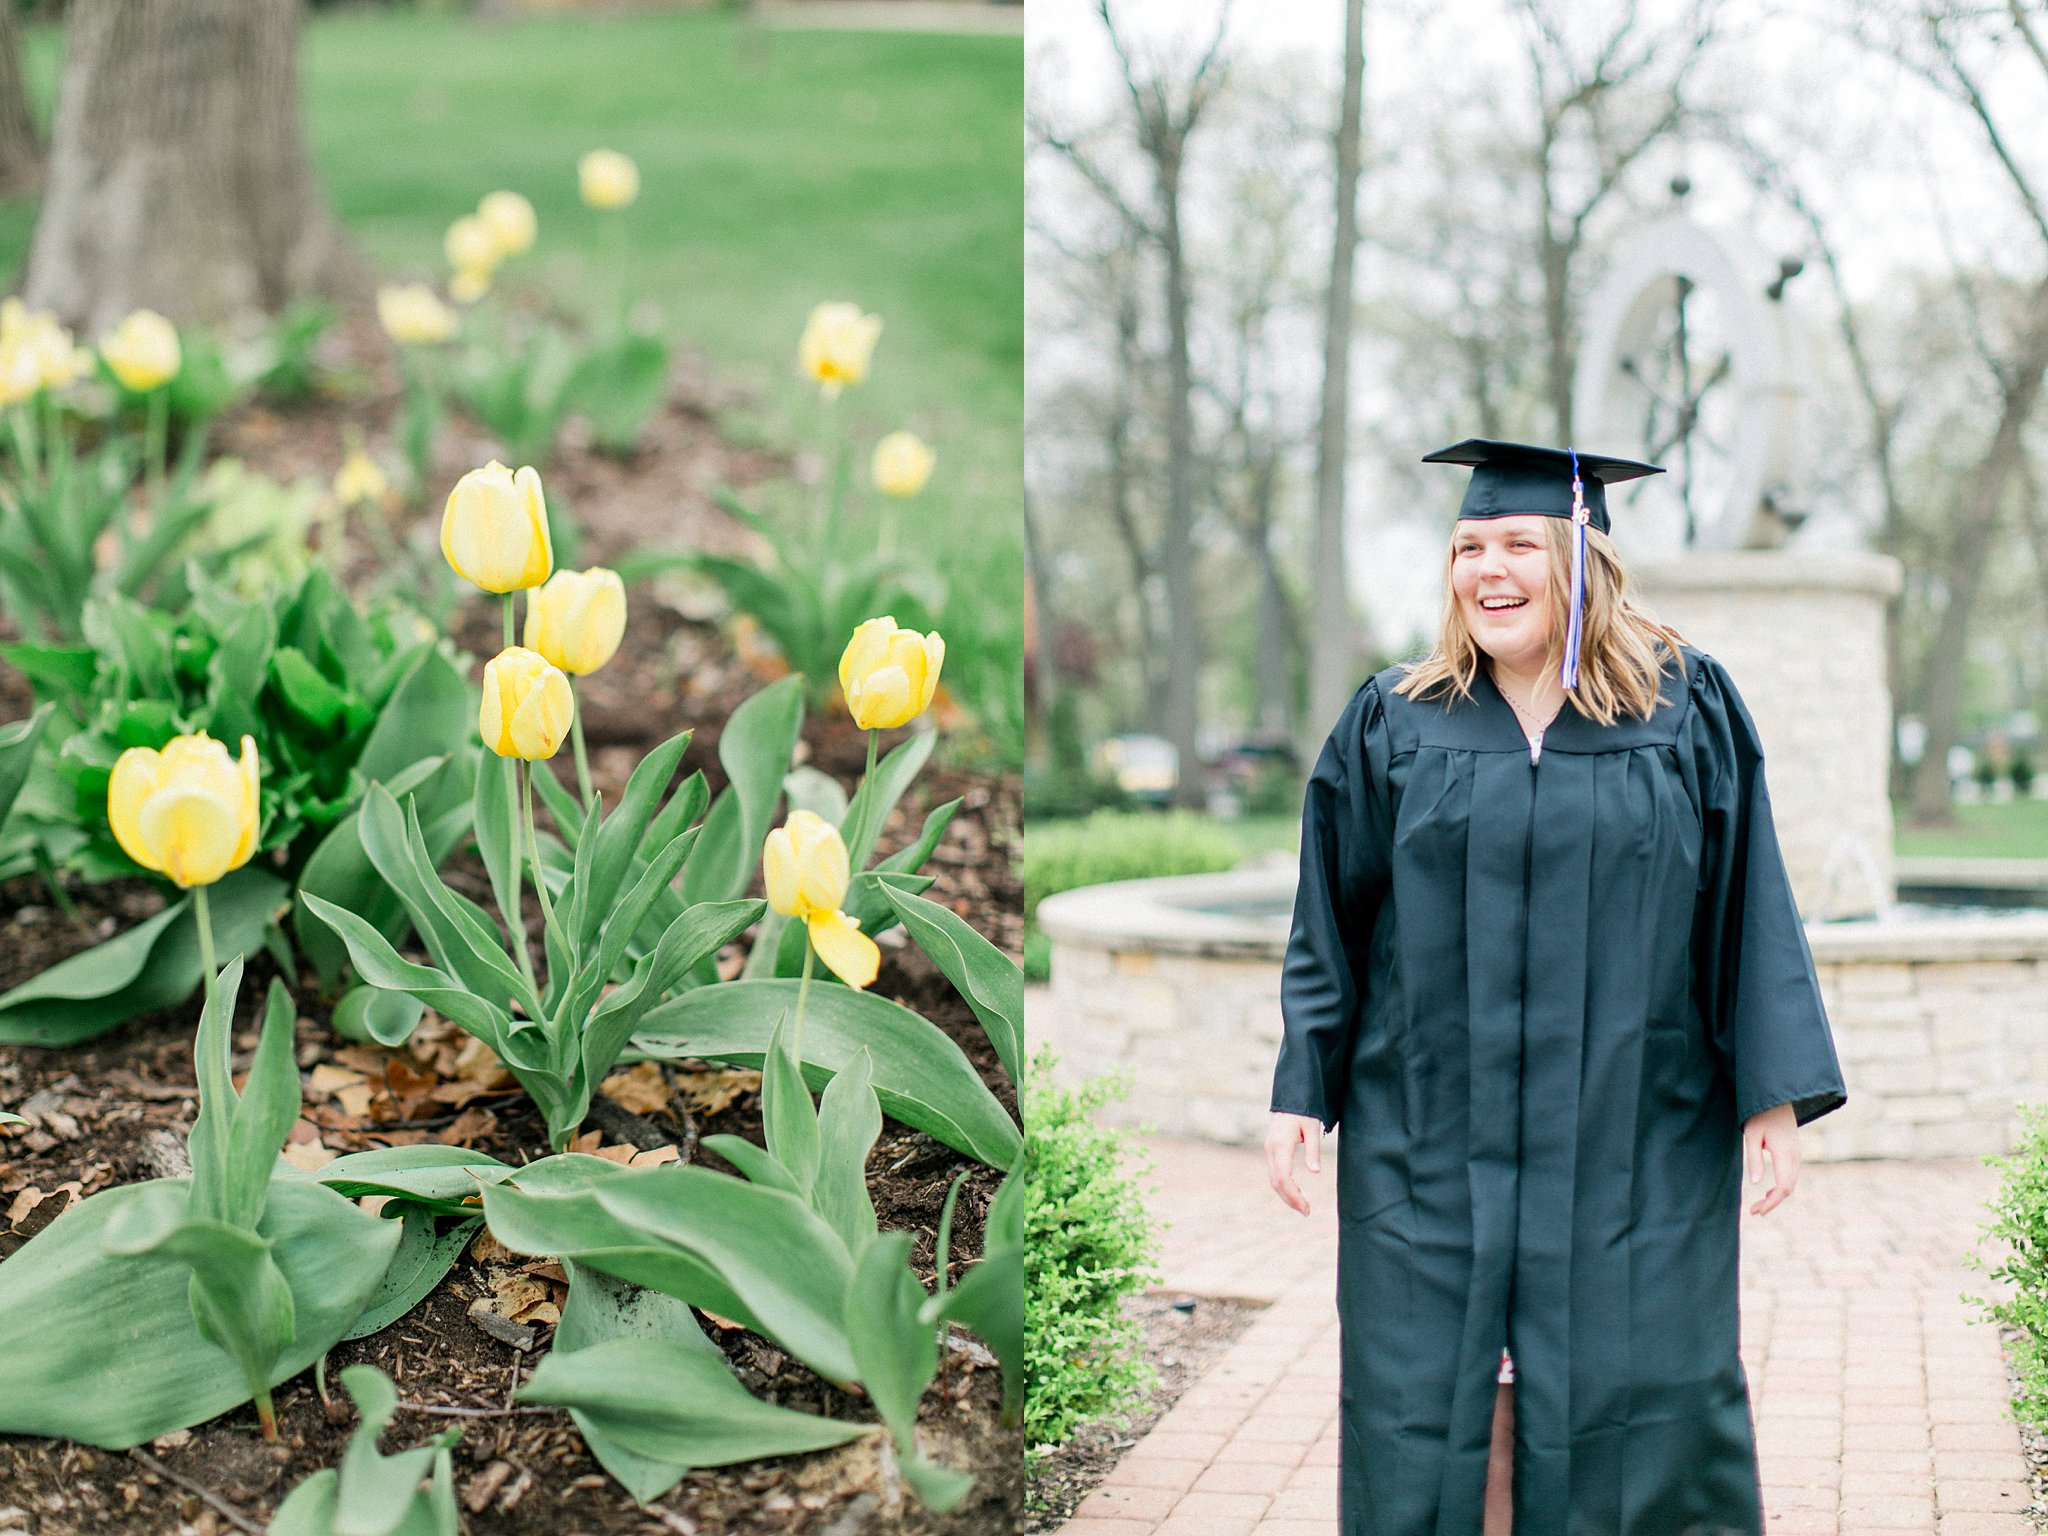 Alexa College Senior Graduate Bethel College FINAL South Bend Senior Photographer-79.jpg